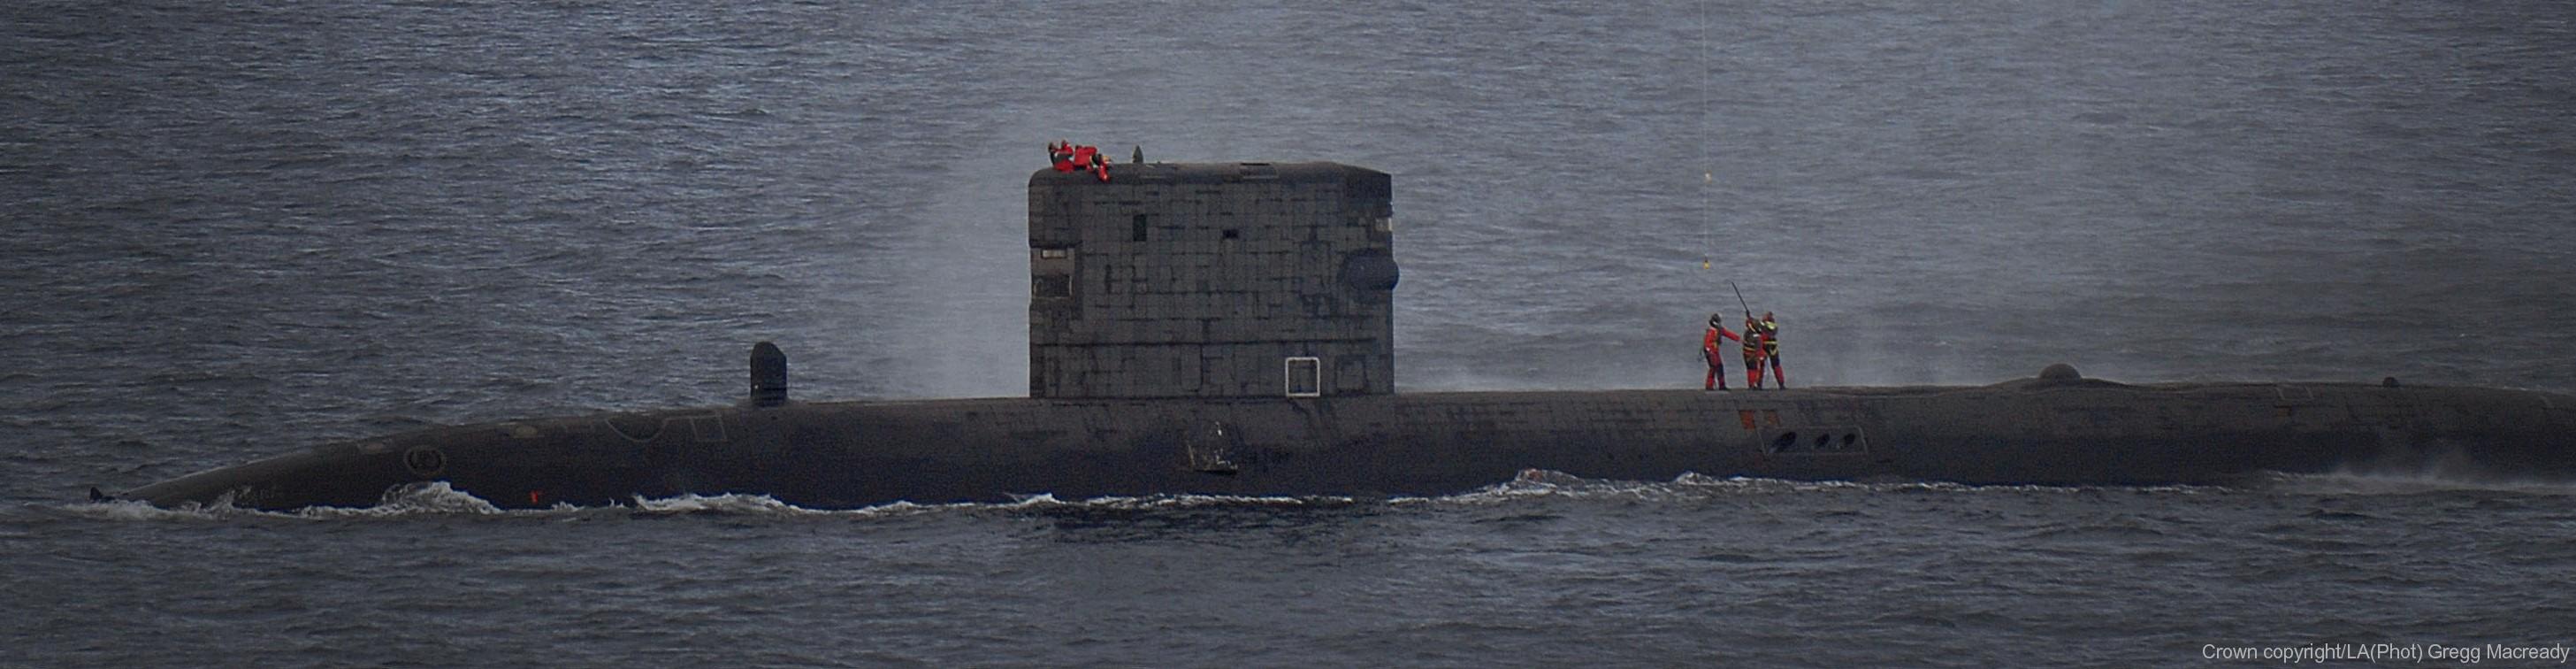 Trafalgar class Attack Submarine SSN - Royal Navy